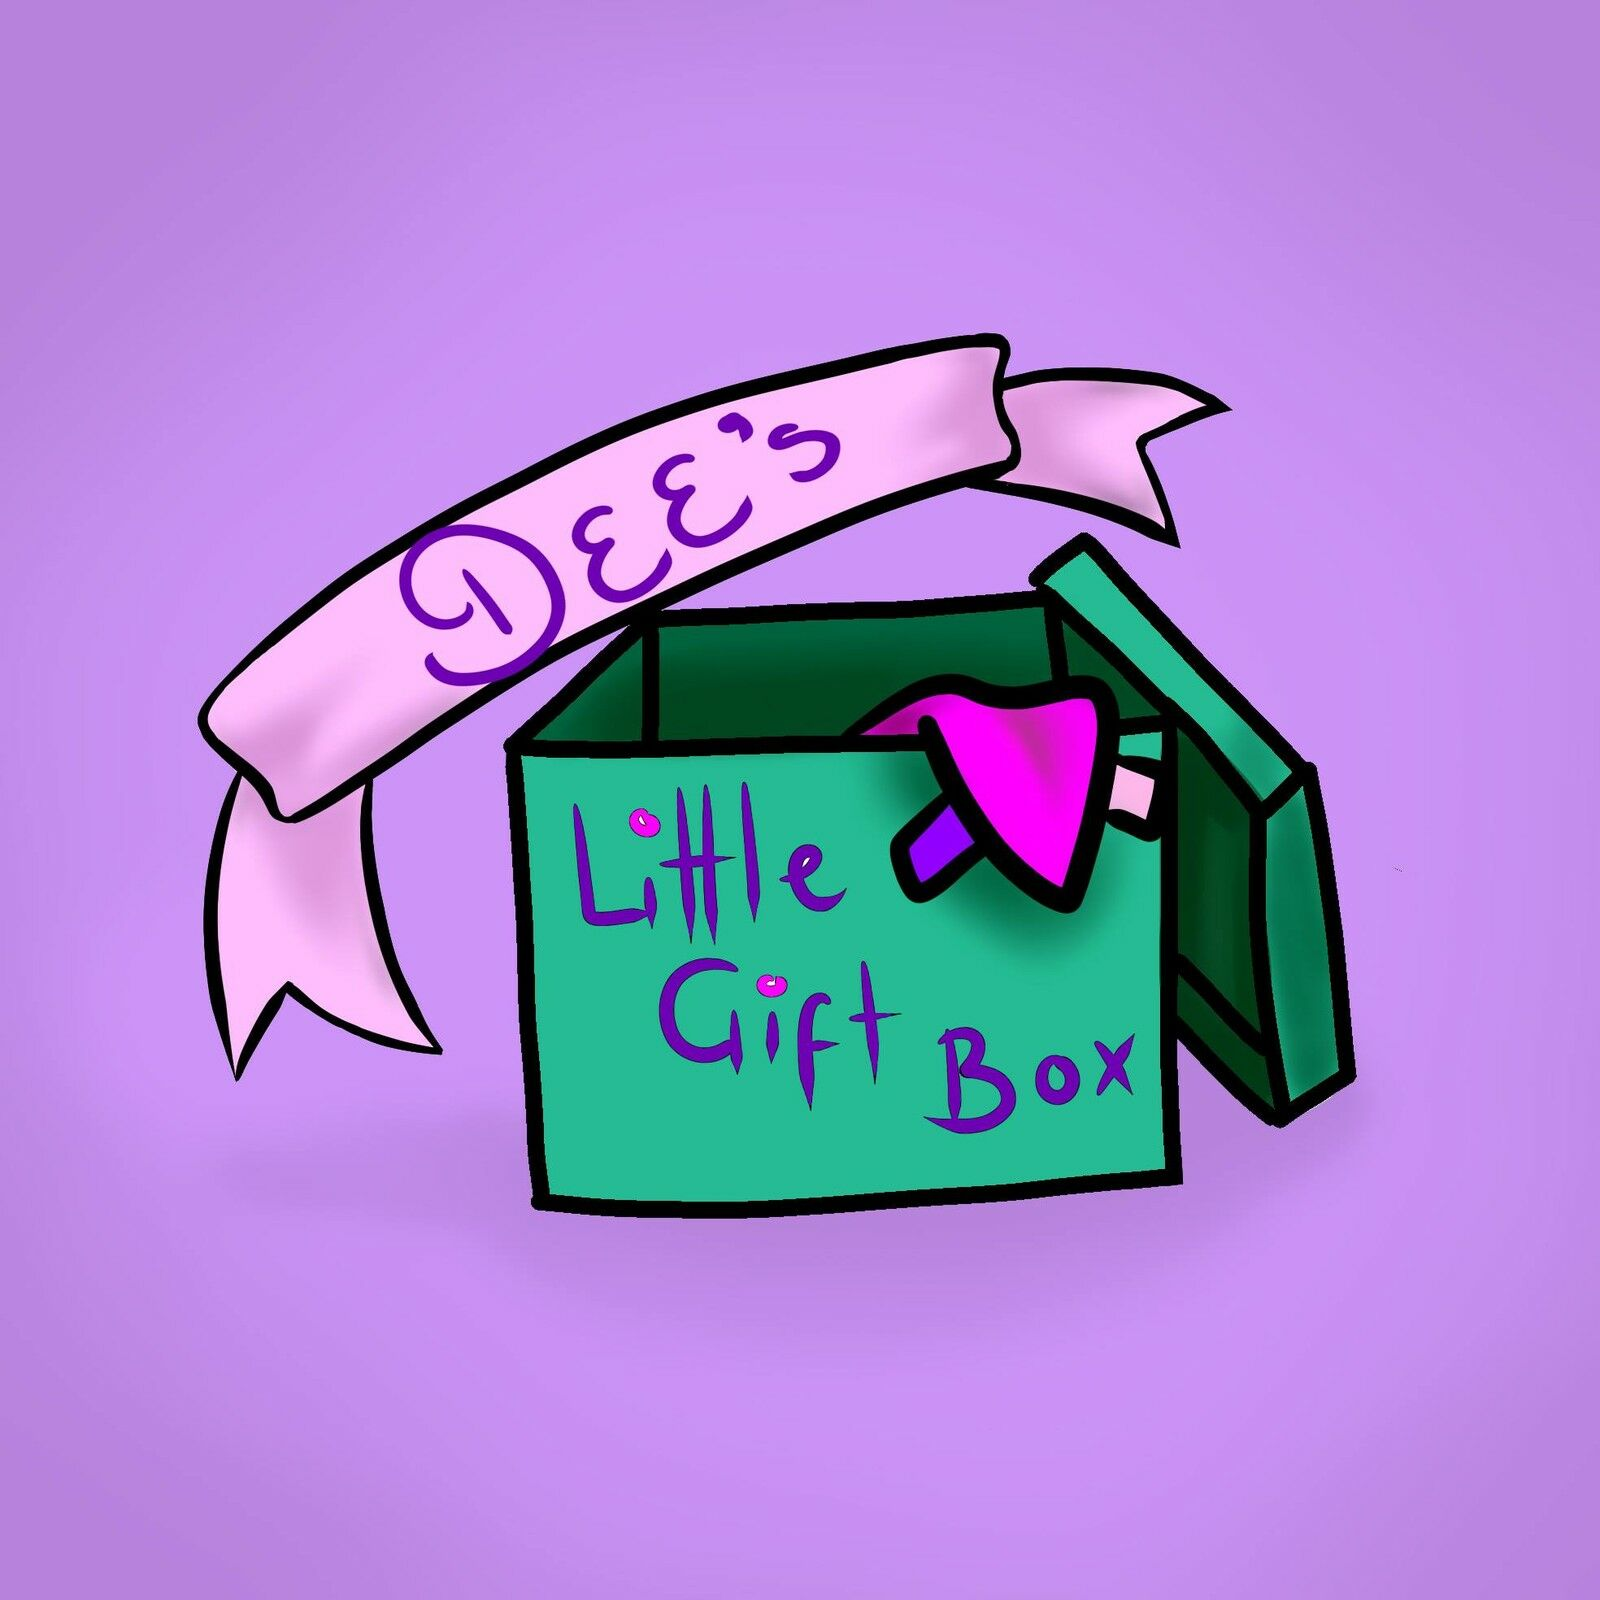 Dee's Little Gift Box